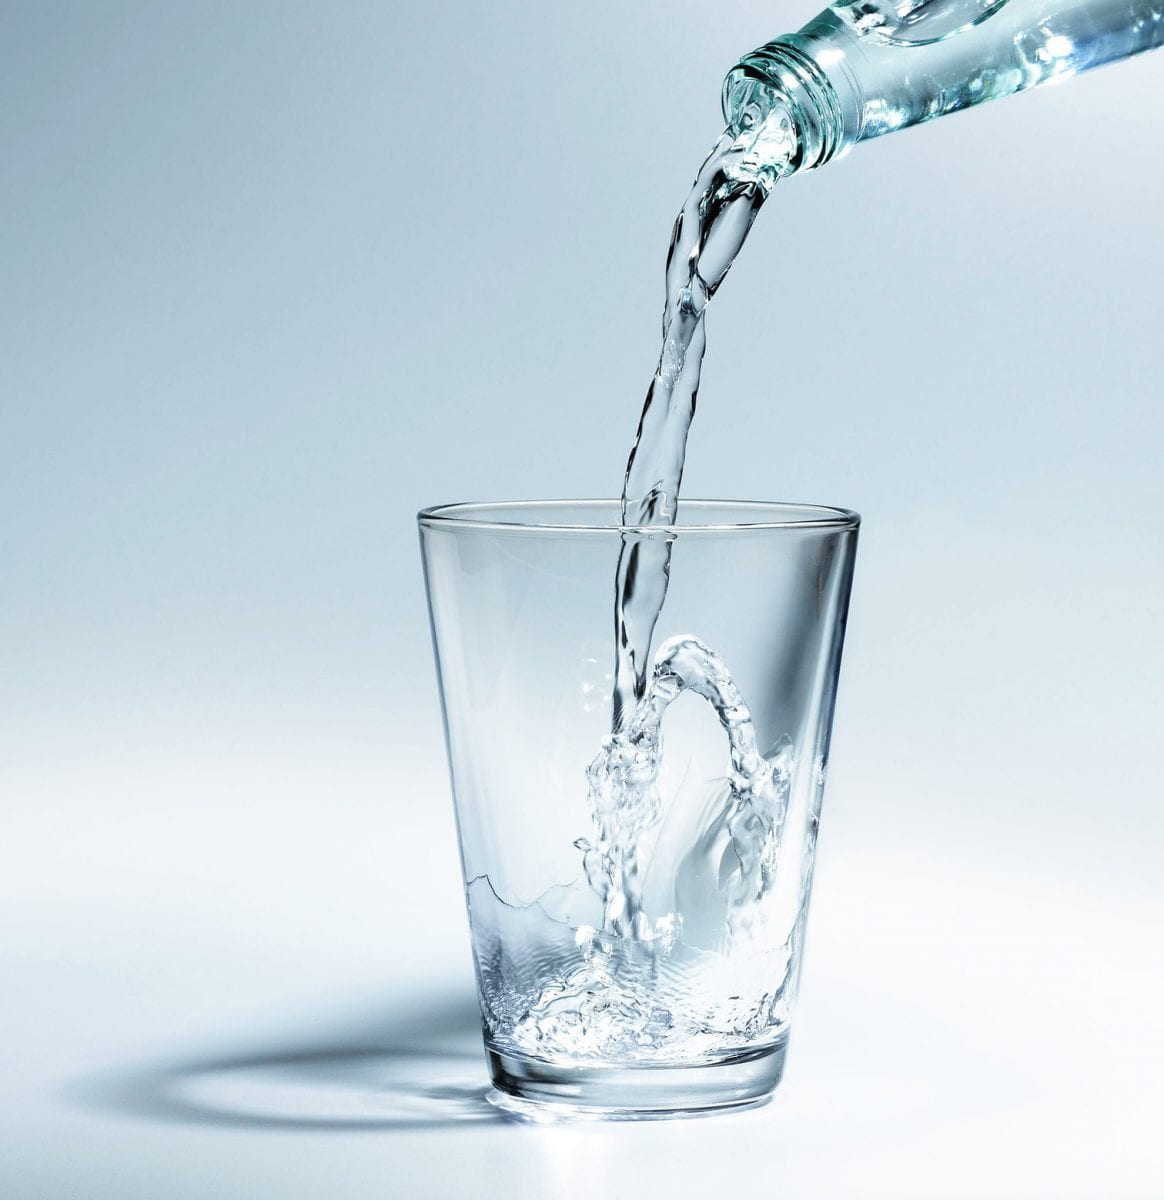 H2O : Hydratation non-stop